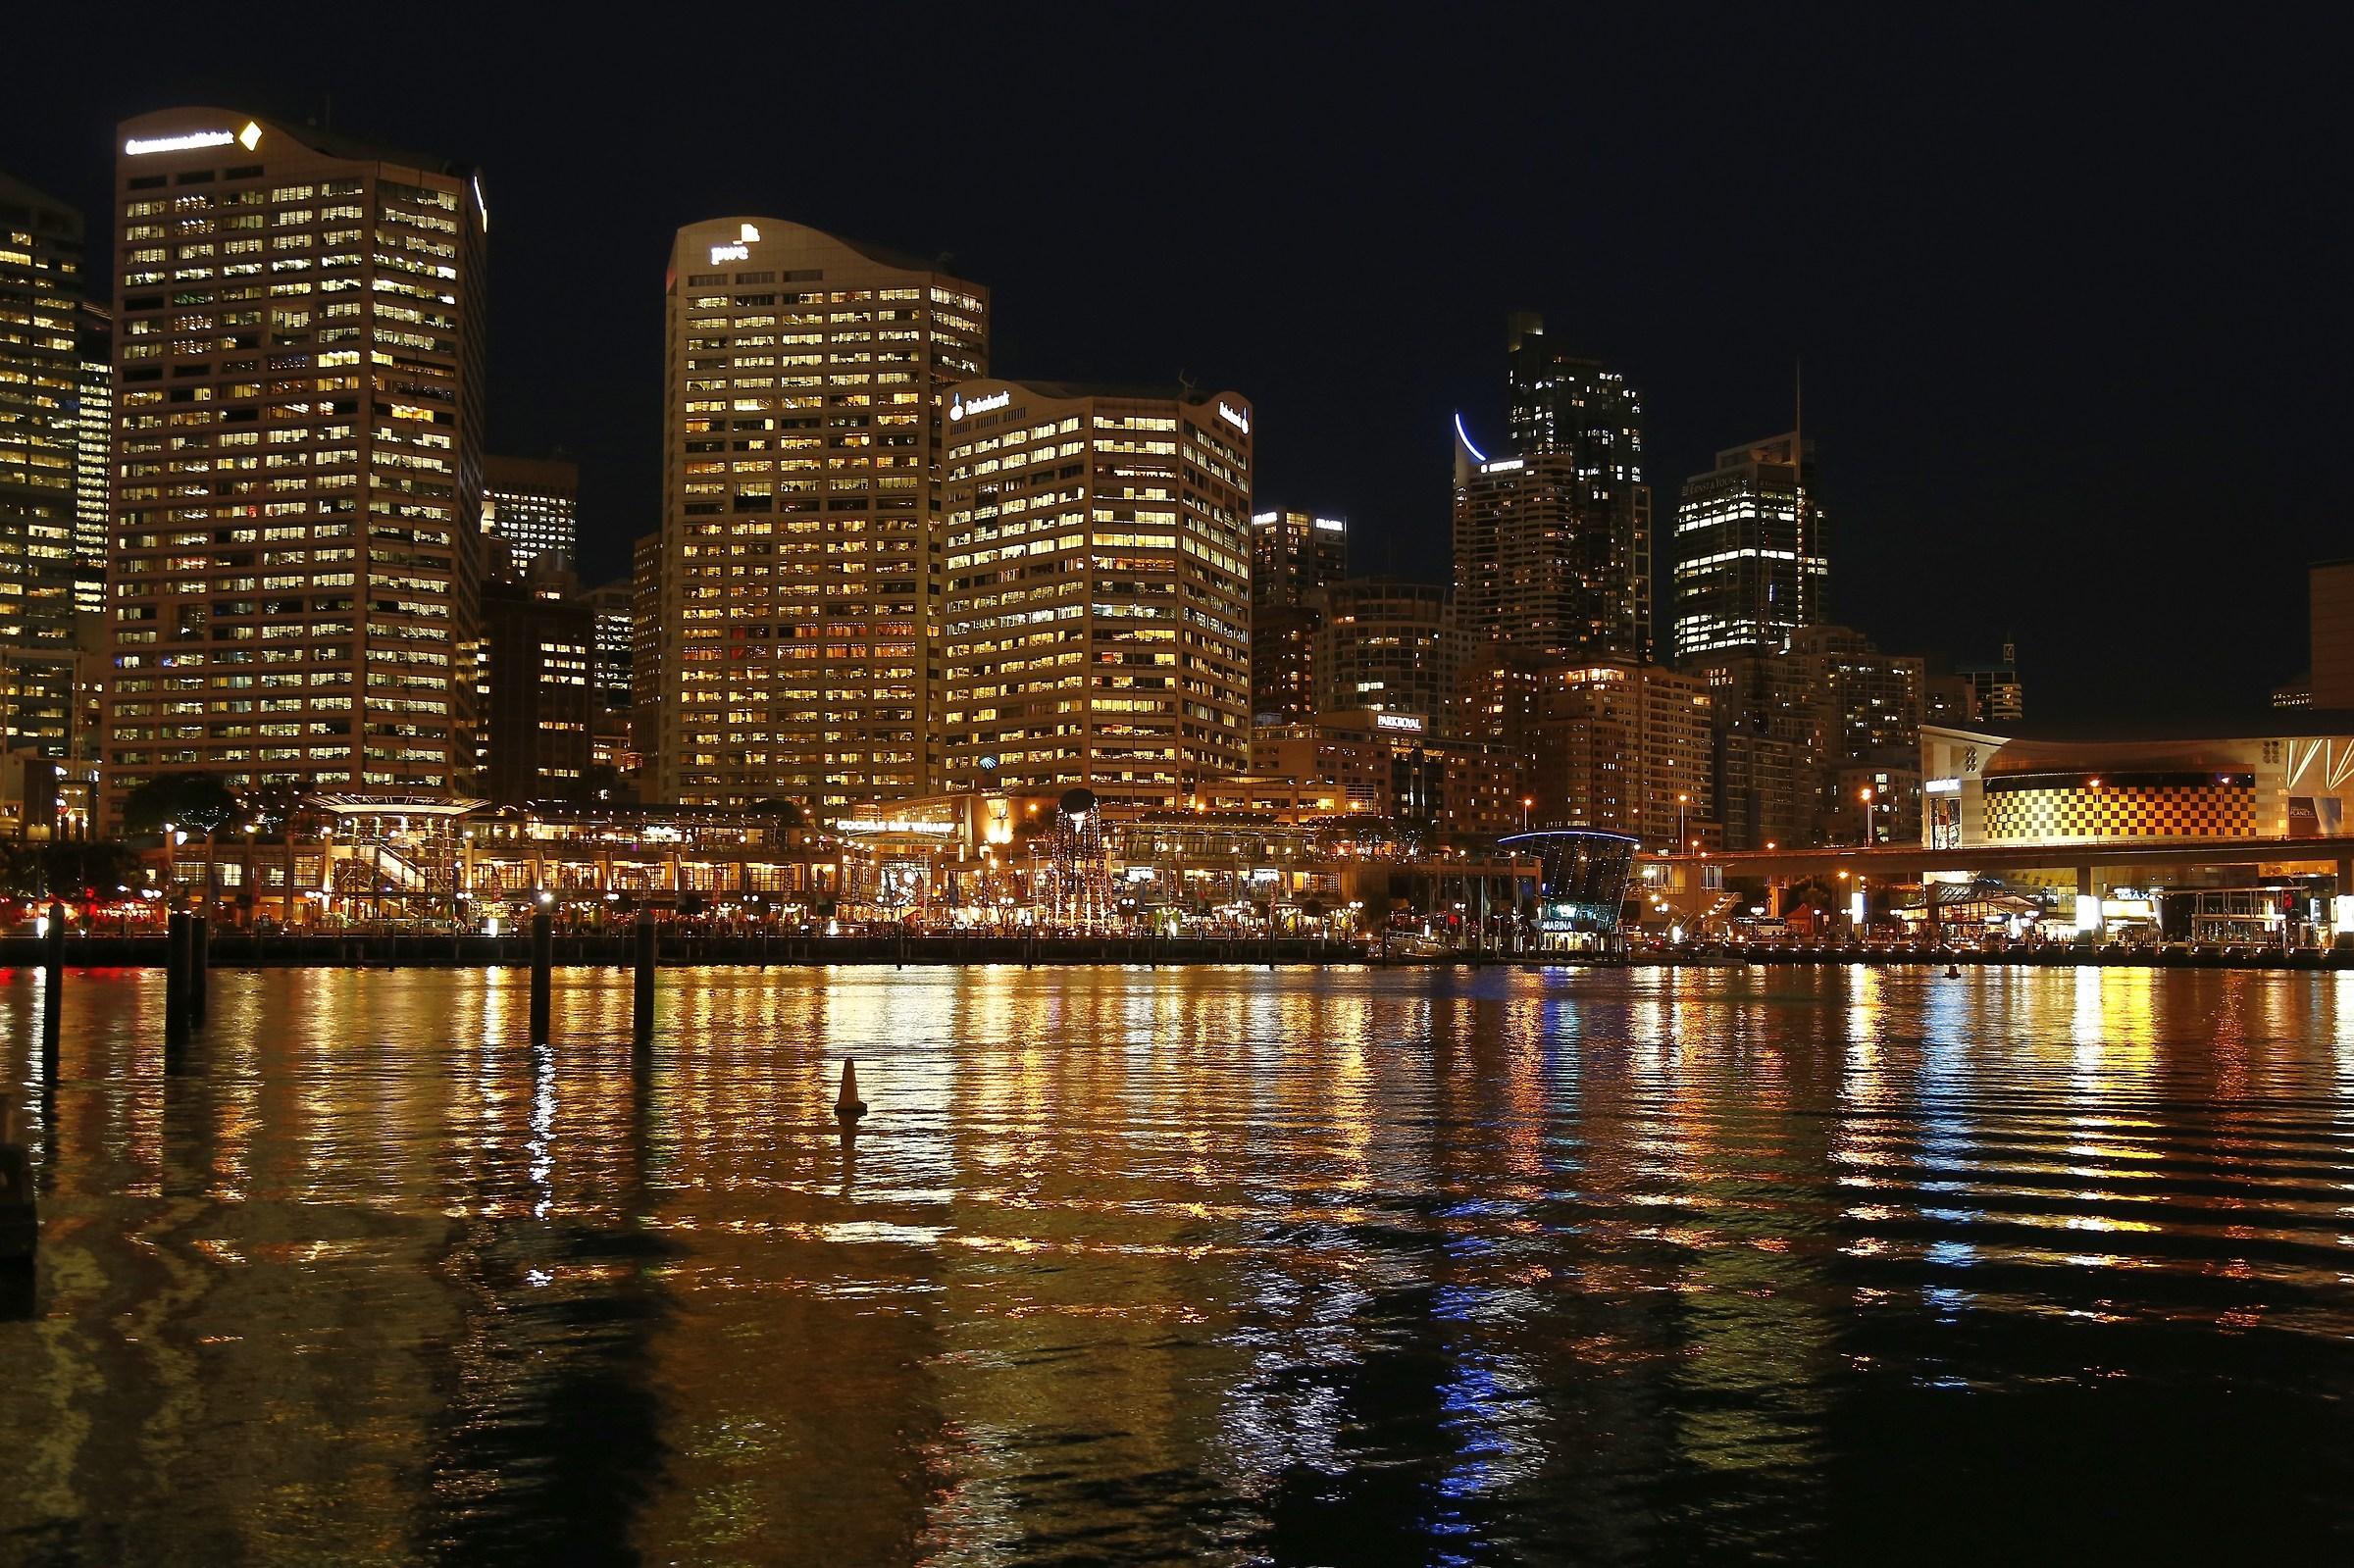 The night magic in Sidney...